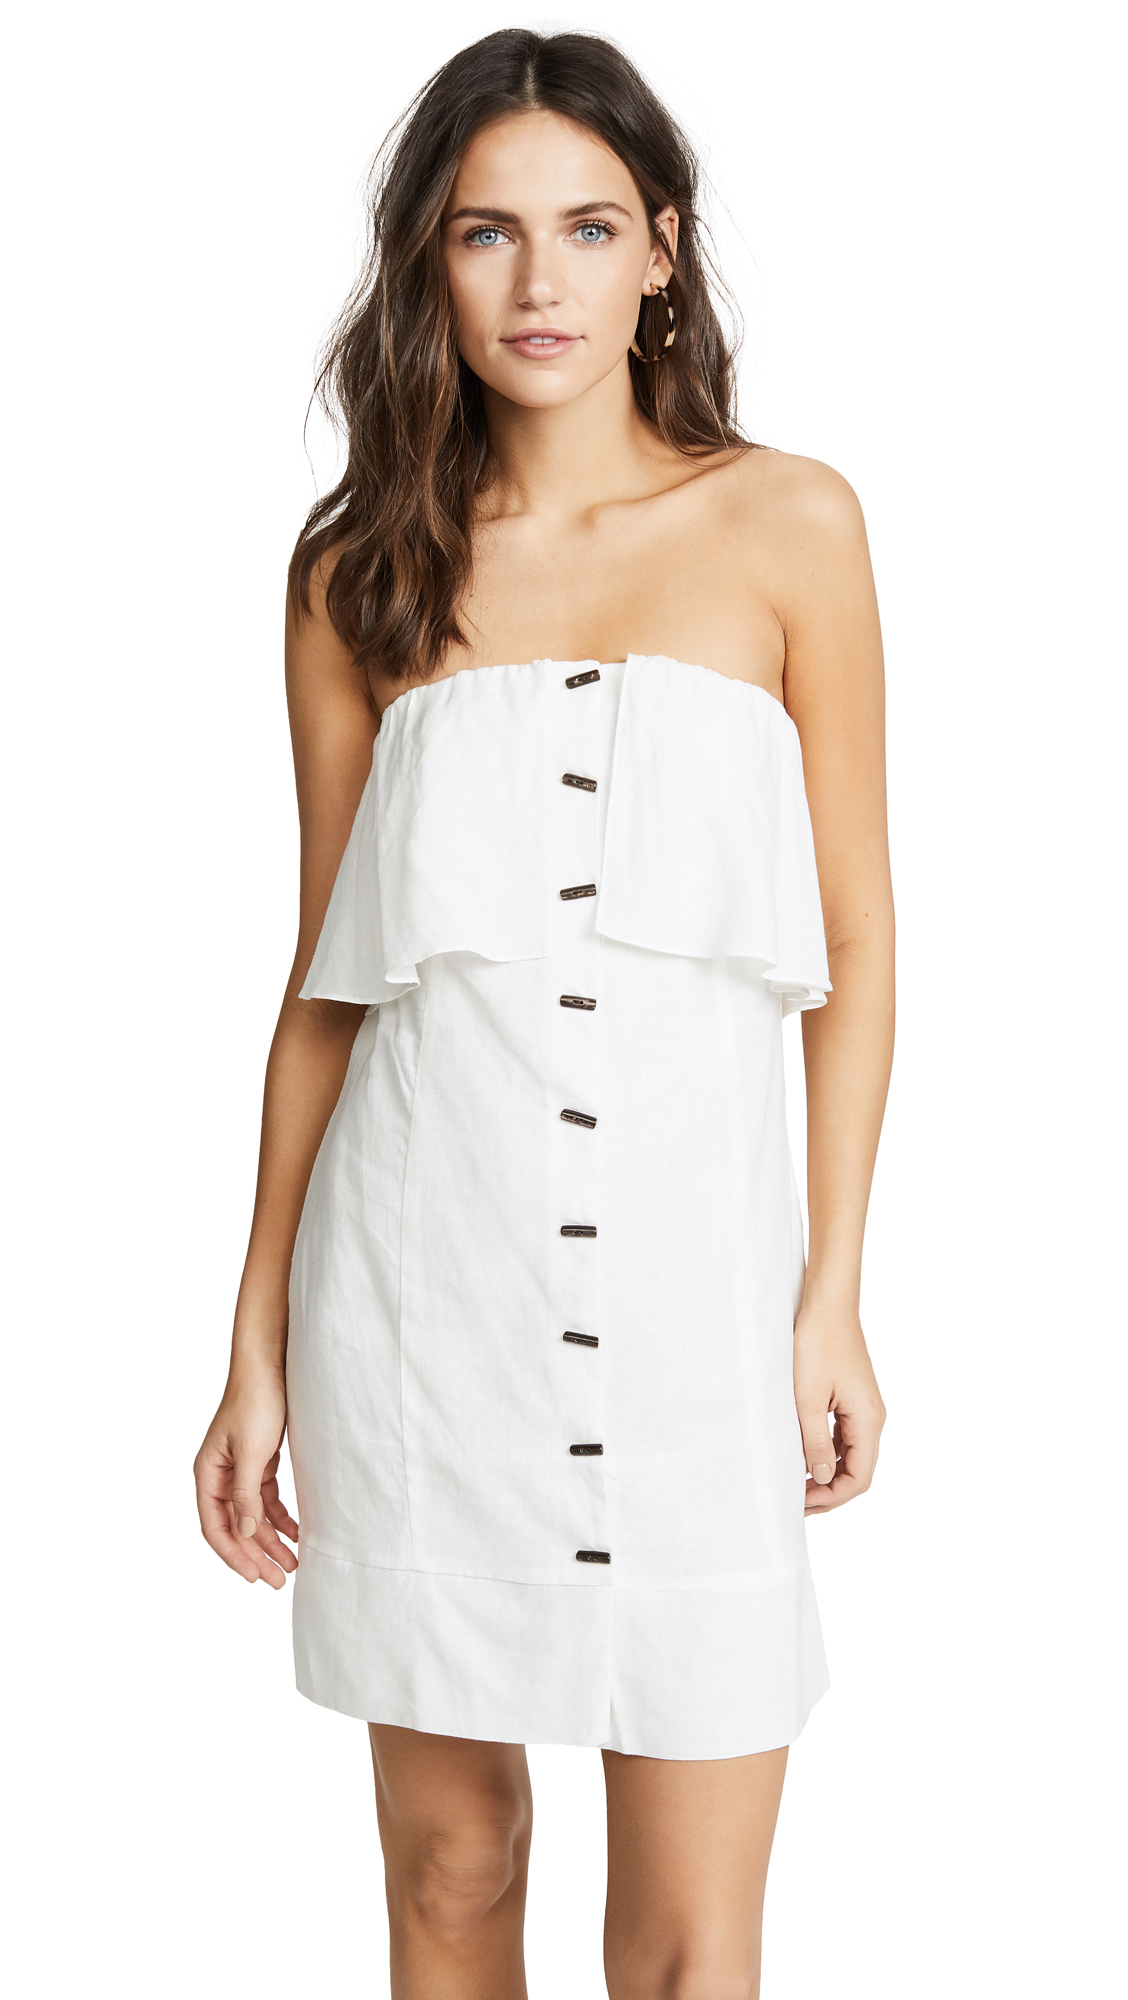 ViX Swimwear Off White Strapless Button Dress - Off White